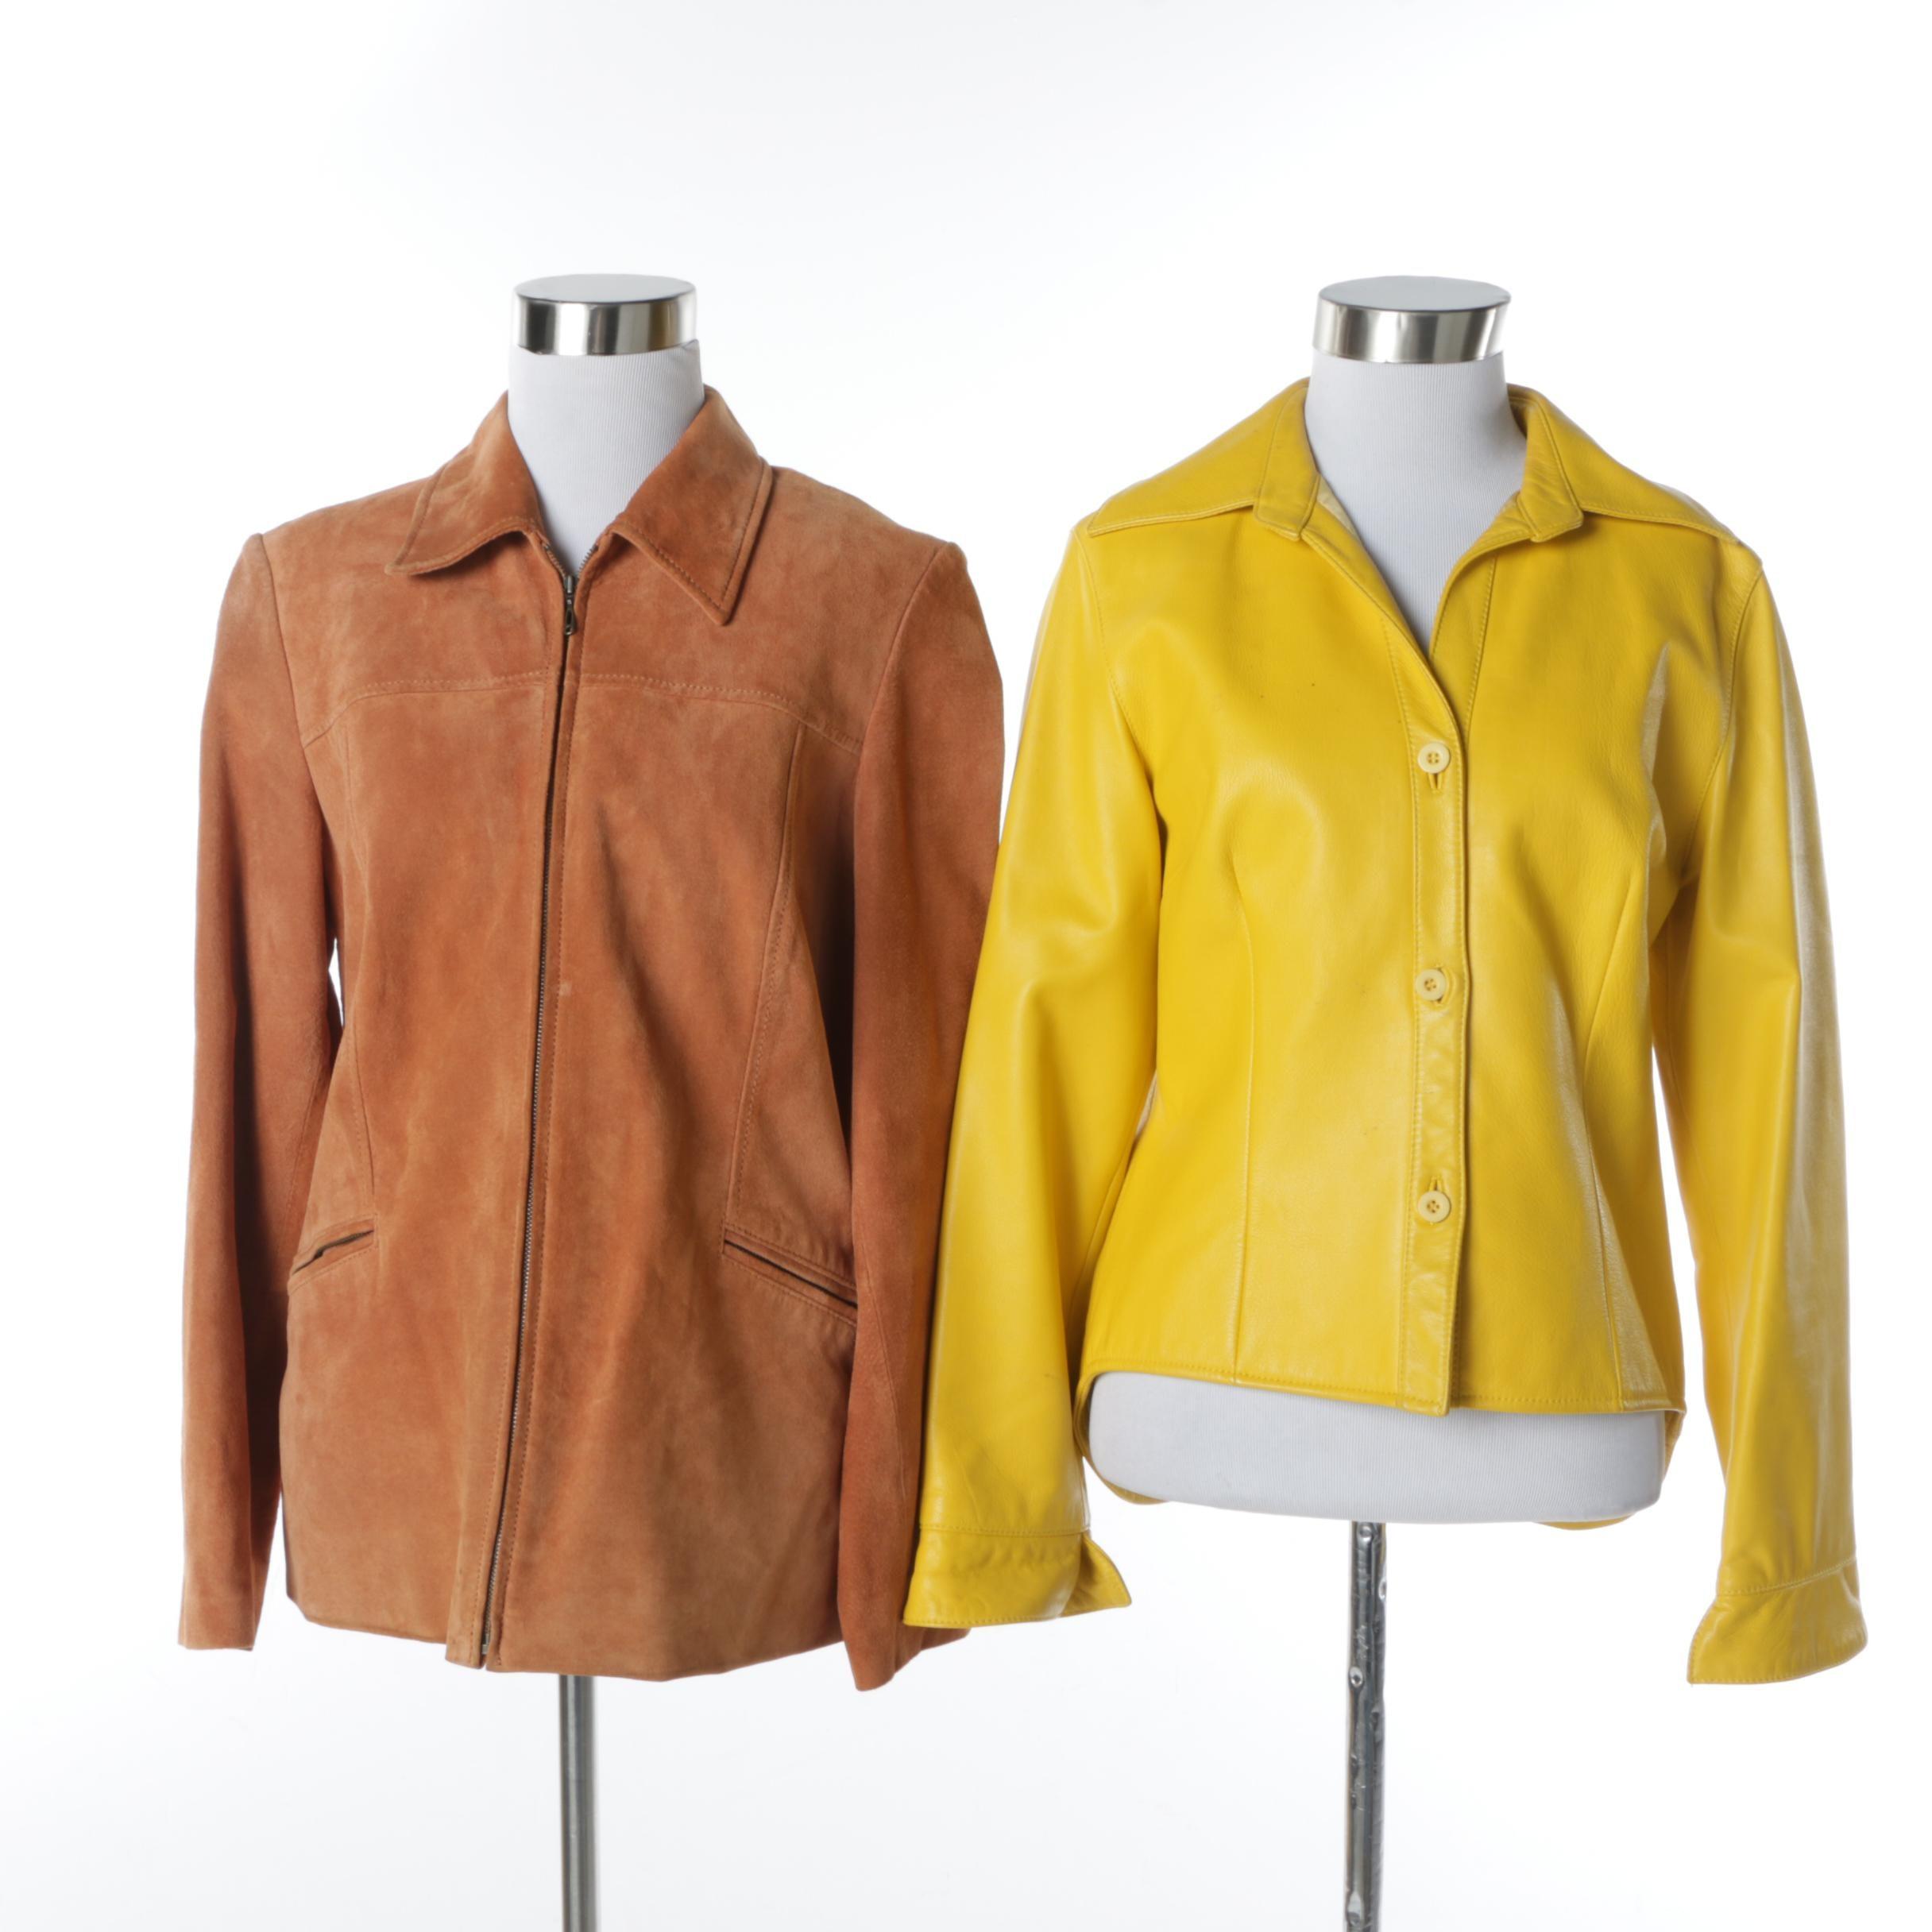 Women's Pendleton and Nicola Berti Leather Jackets